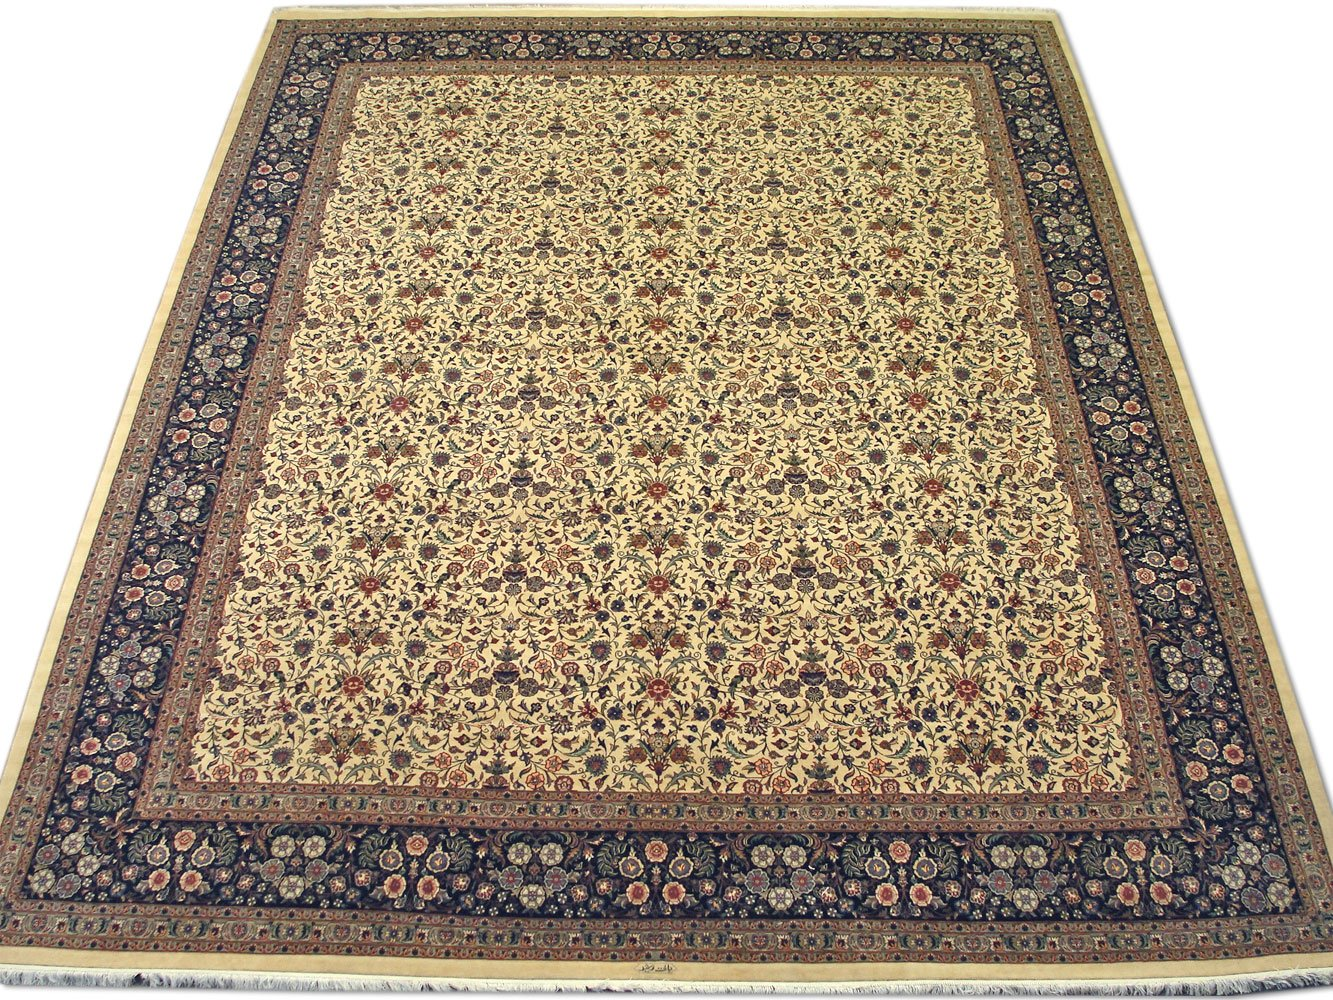 Hecho a mano tradicional persa alfombra Isfahan, lana, color blanco, 365 x 467 cm